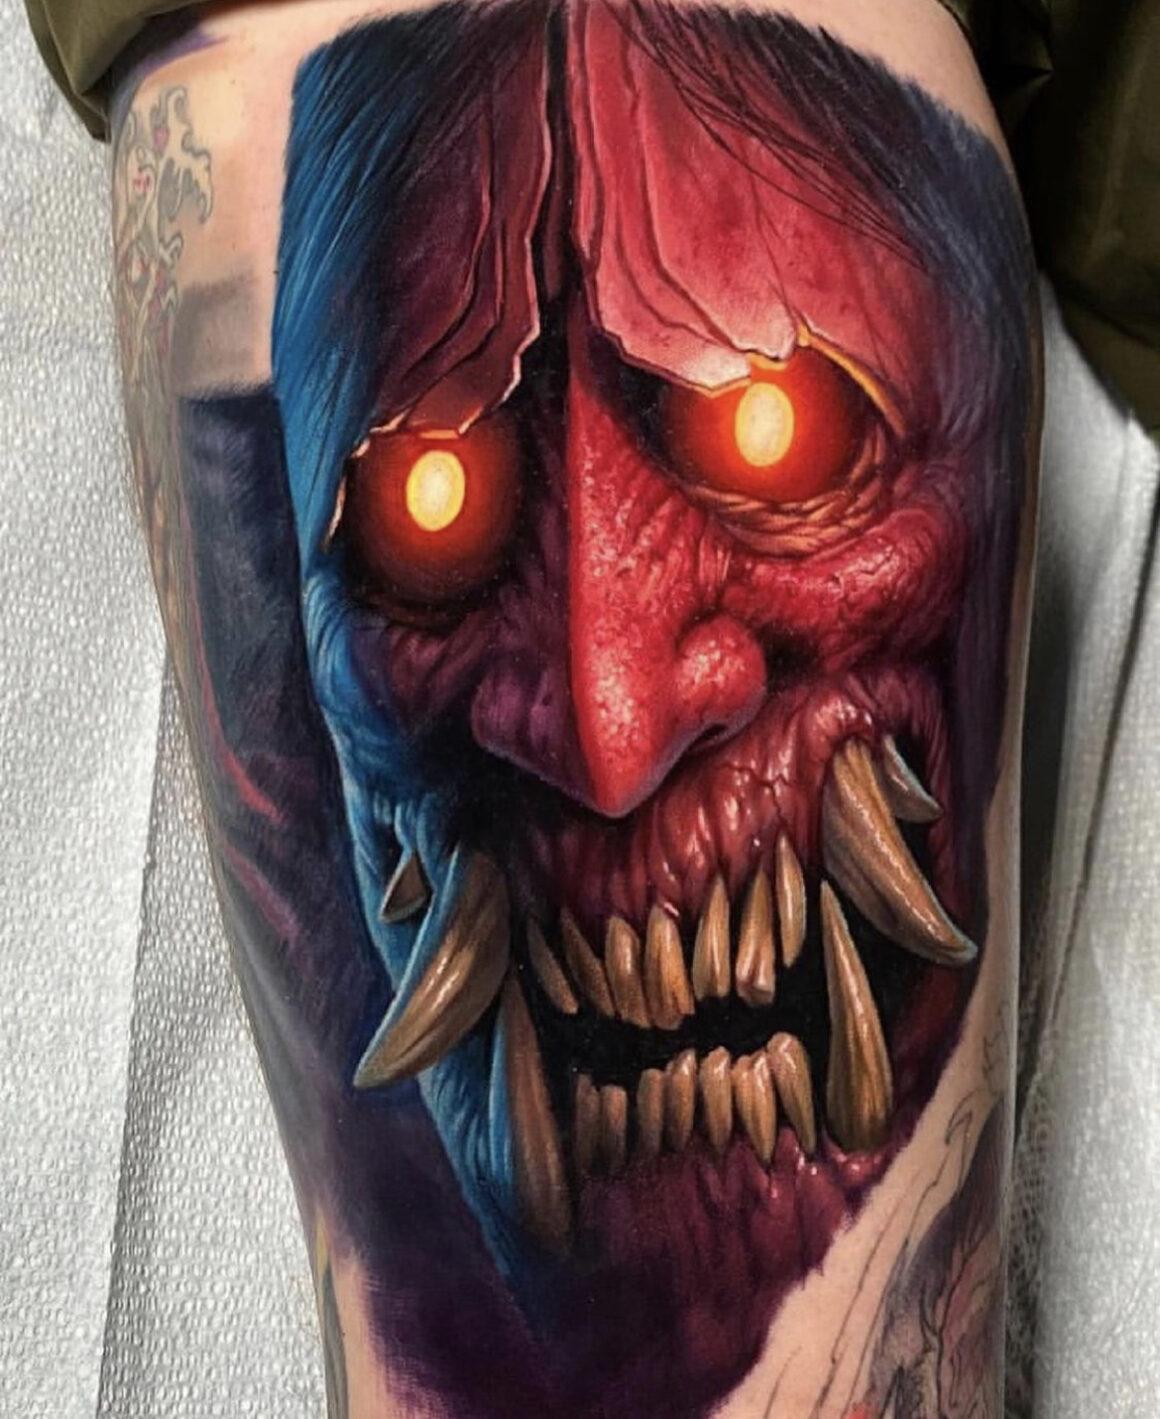 Evan Olin, Powerline Tattoo, Cranston, USA